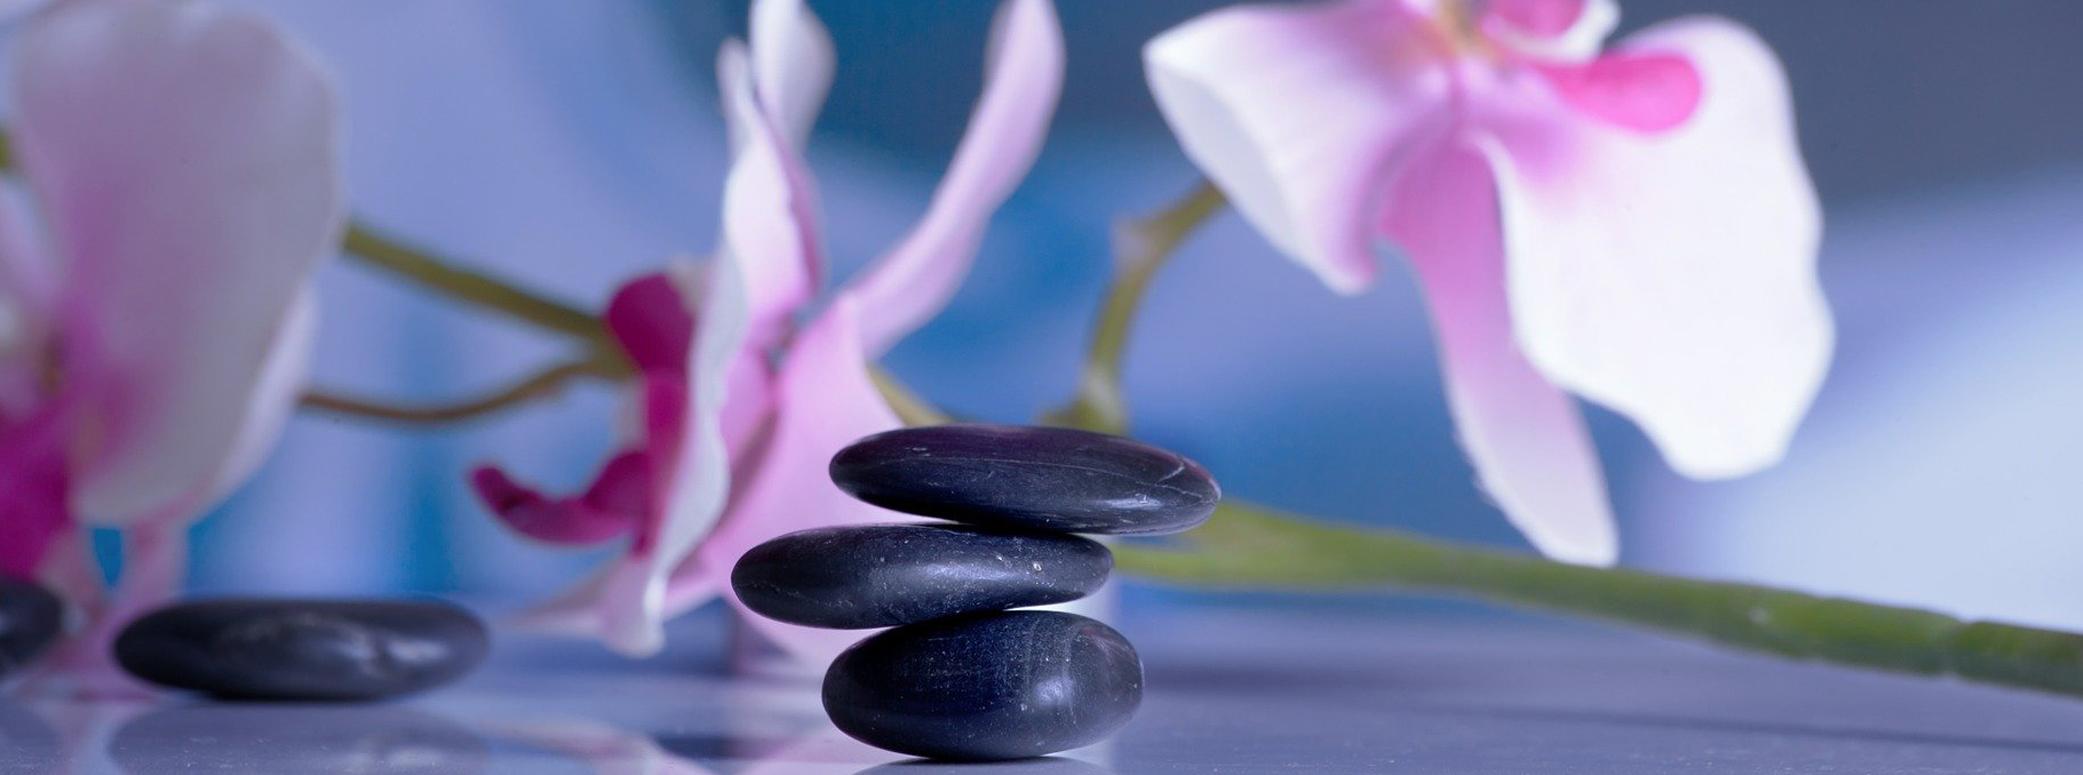 Paths To Wellness